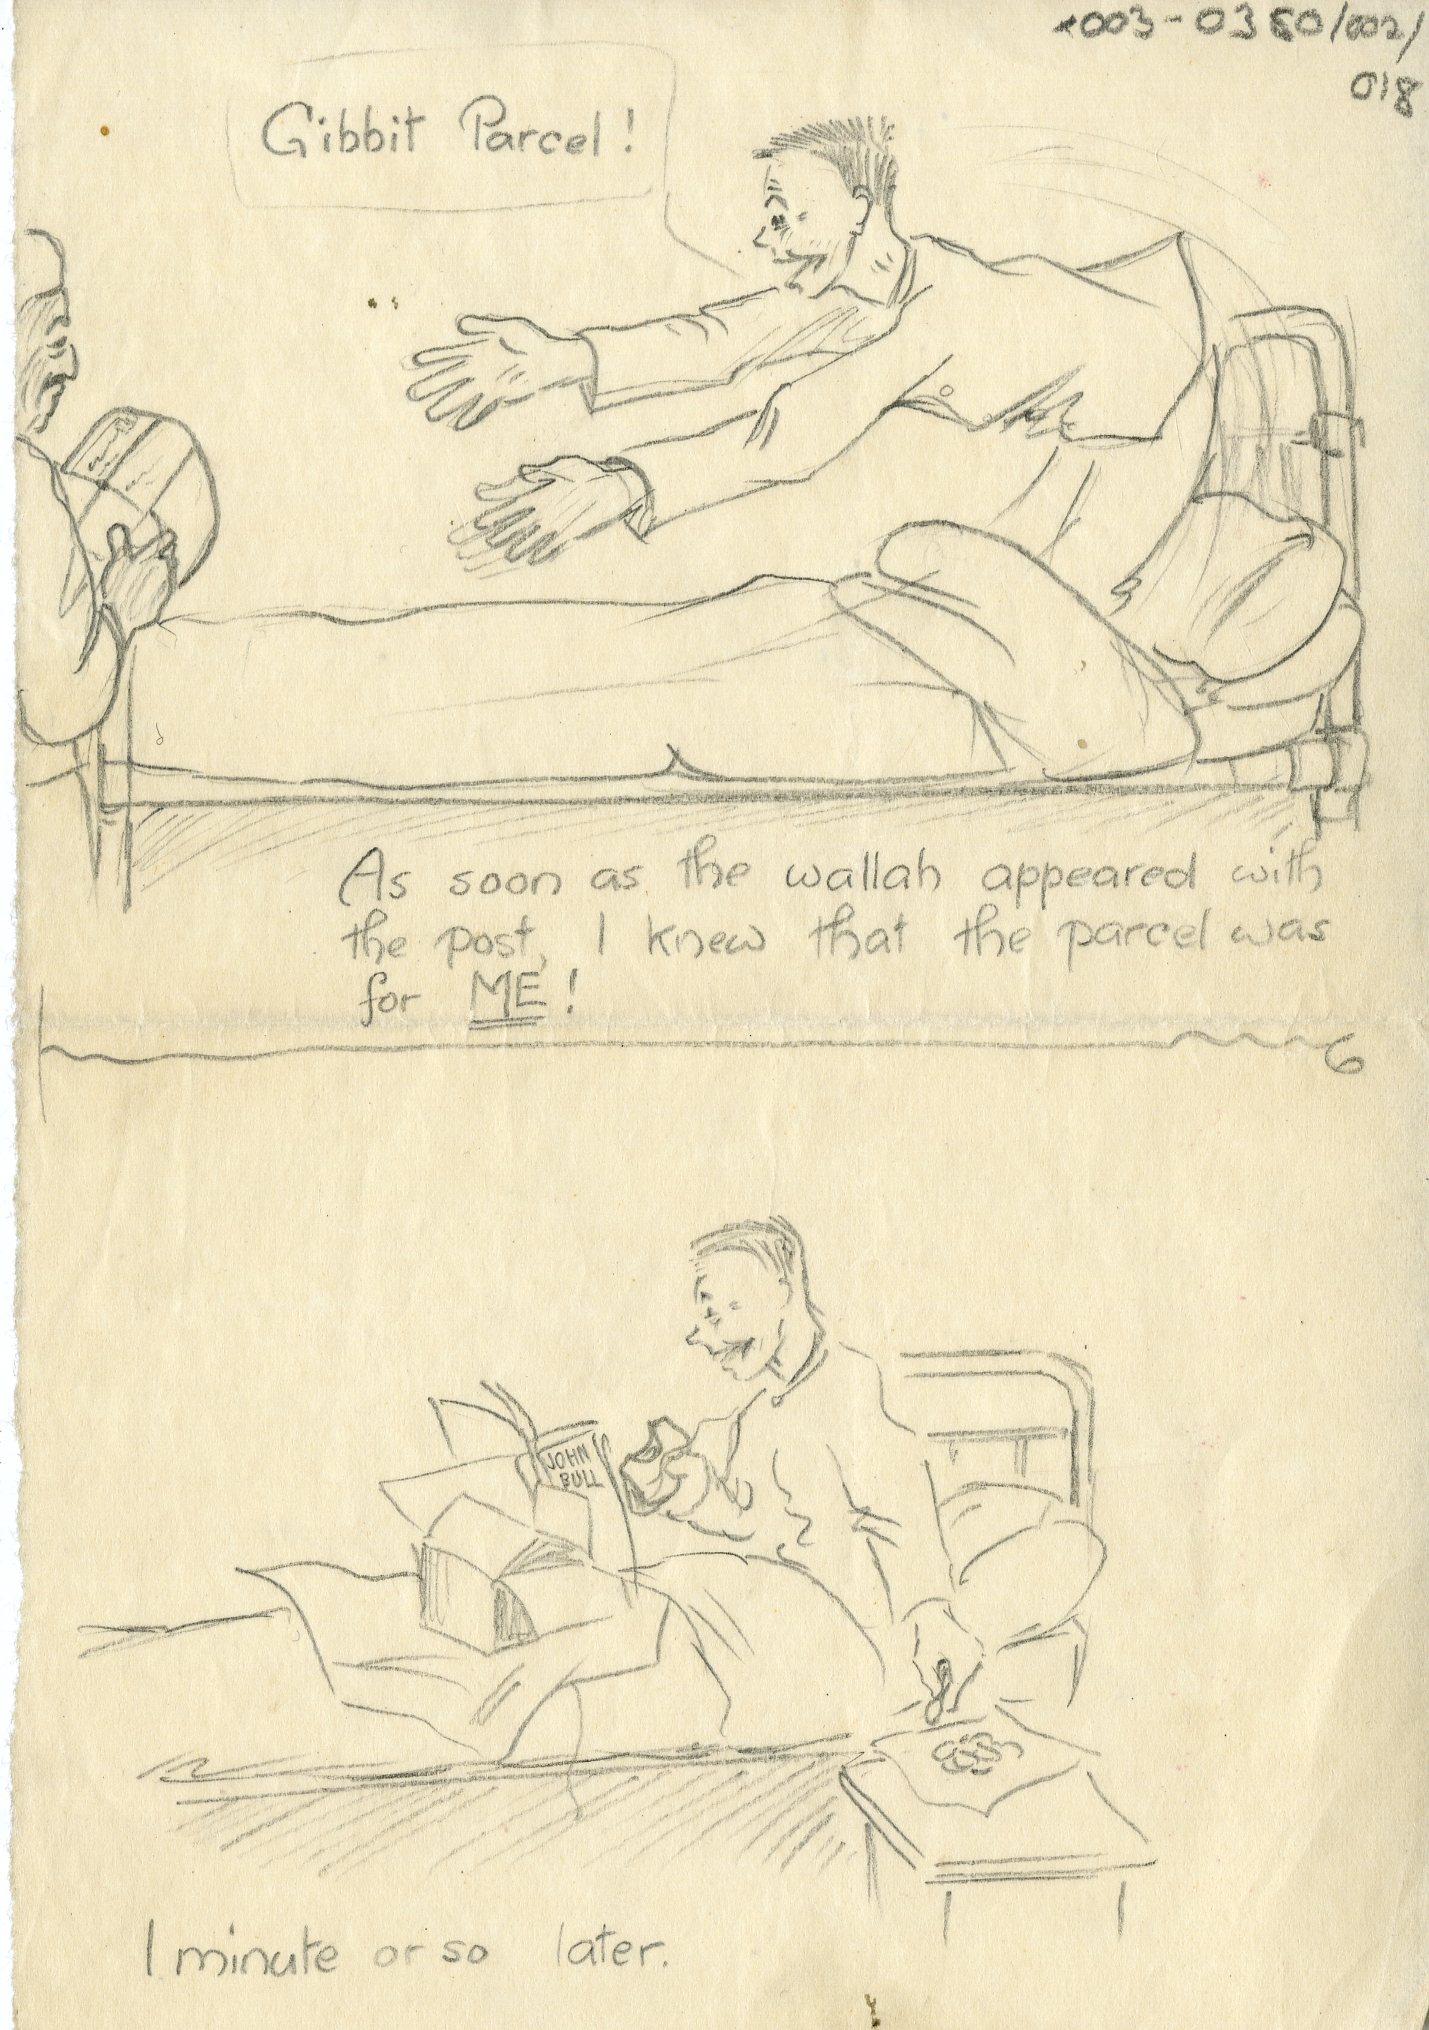 Image: X003-0380/002/018 - Cartoons by A Mech 3 John Roscoe. RAF Museum